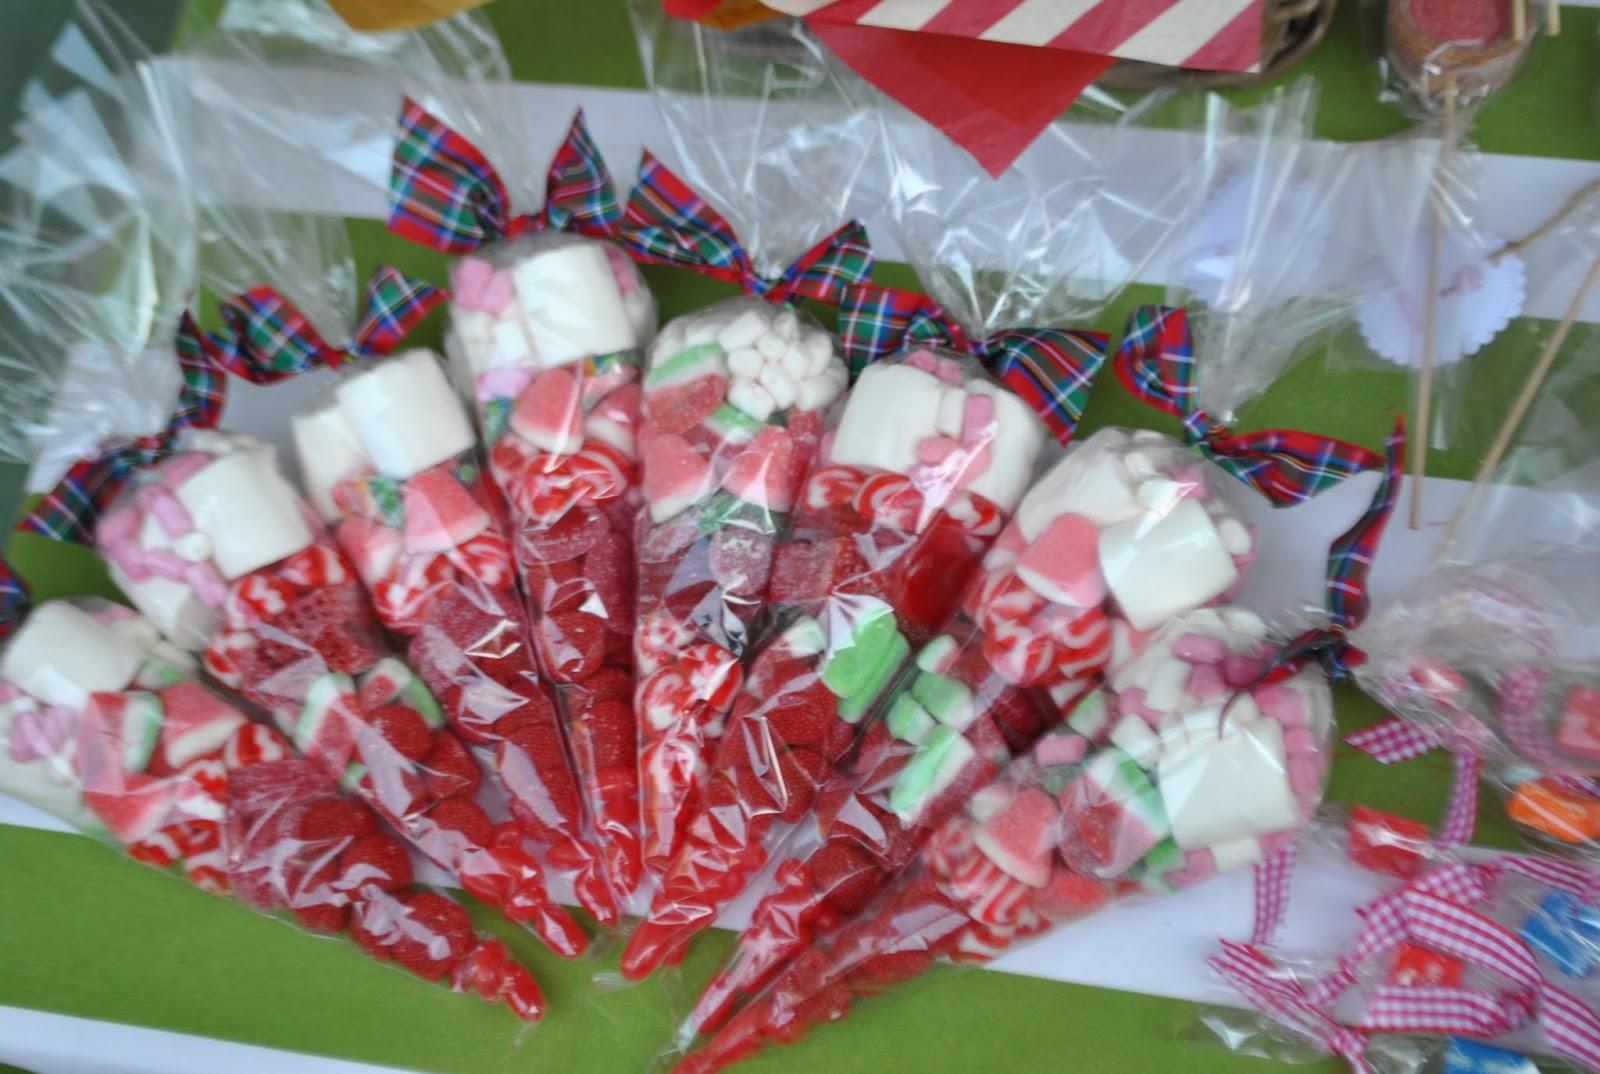 Los detalles de bea especial navidad for Detalles de navidad